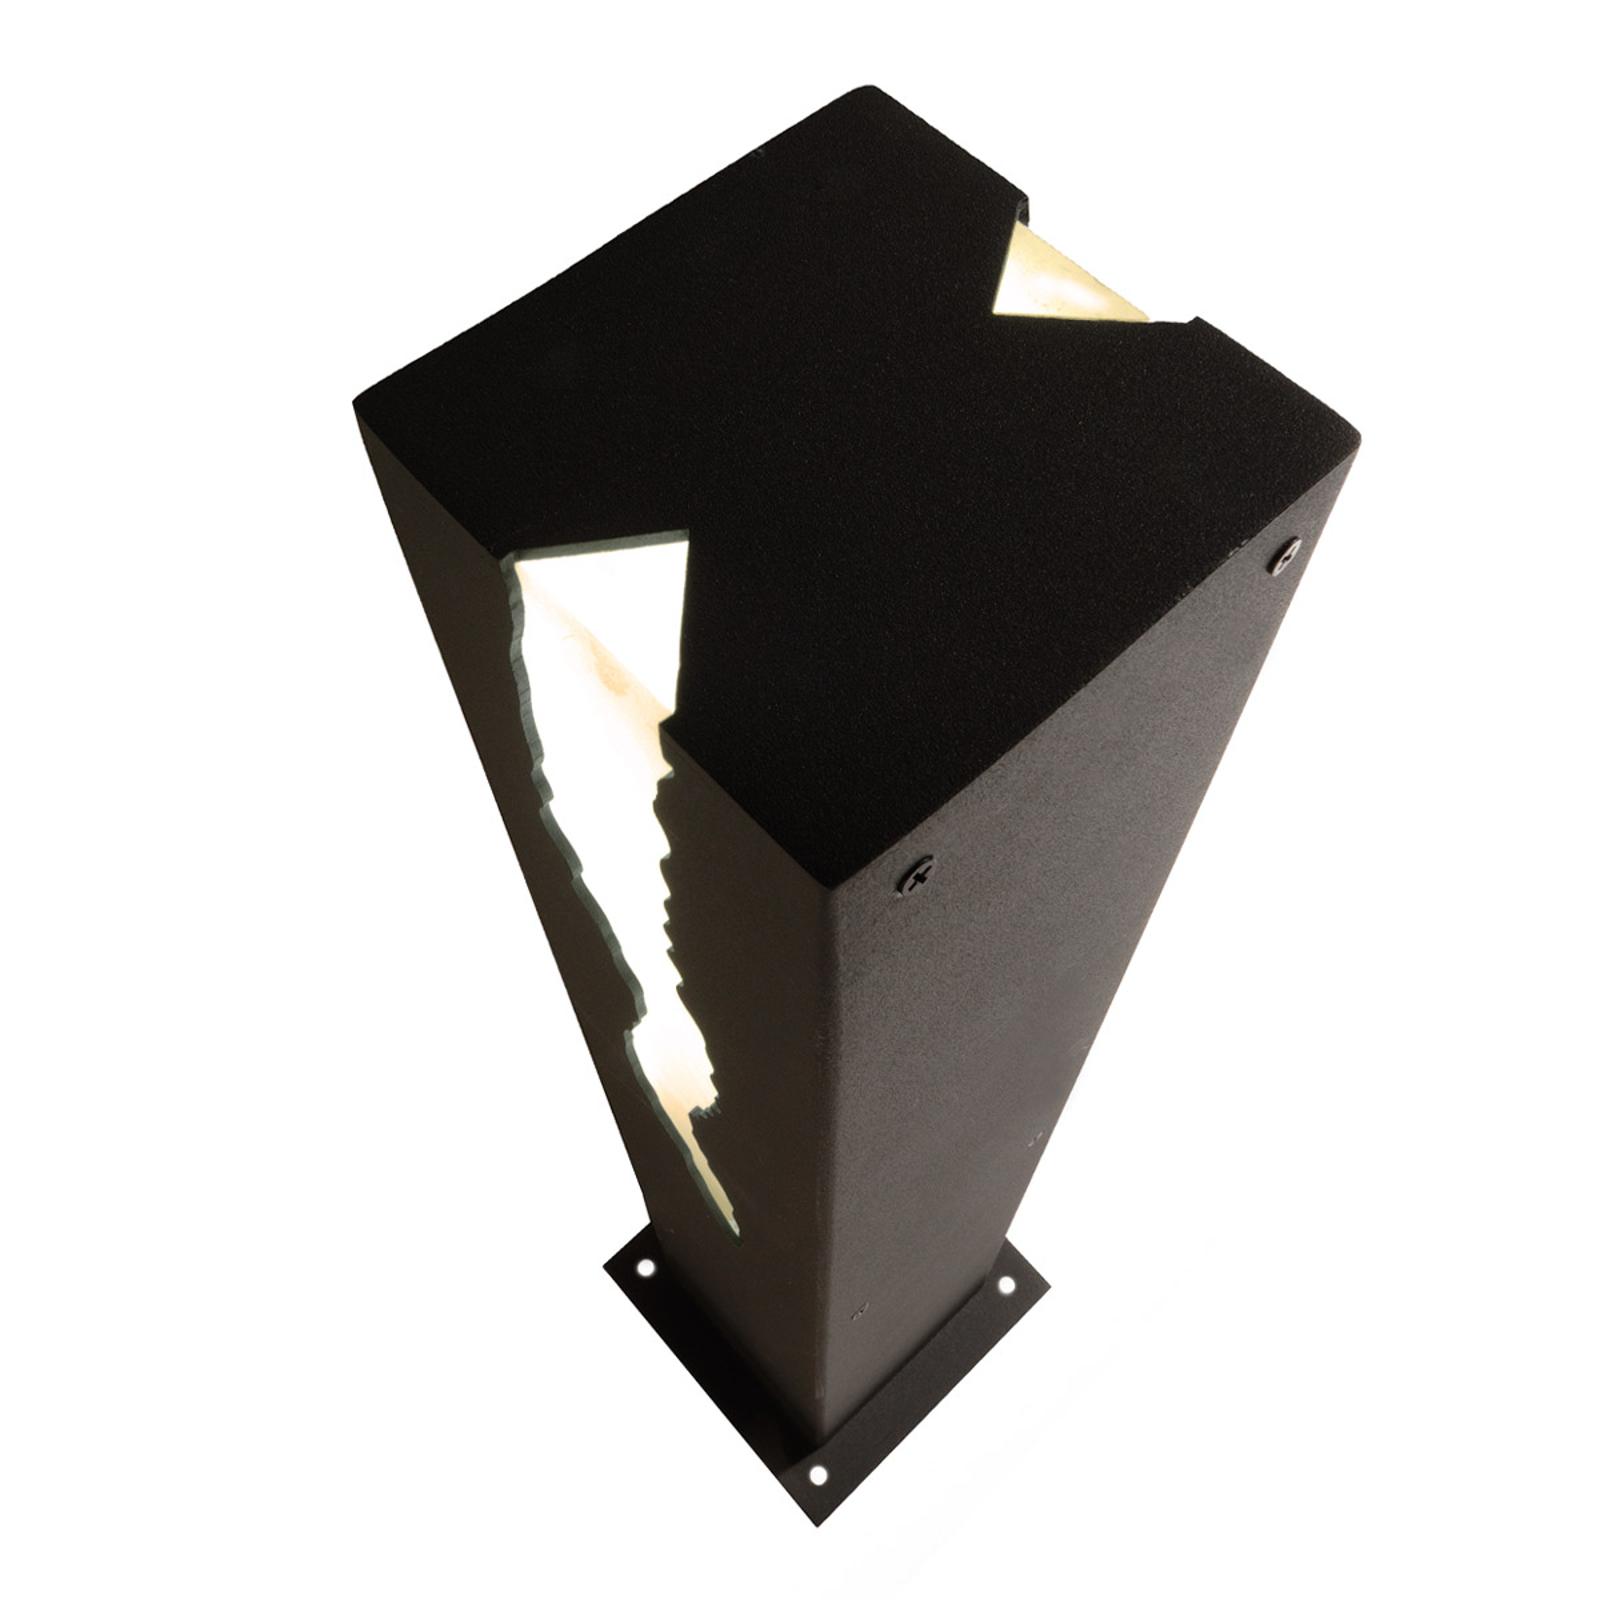 Lampioncino LED El Rayo, emissione bilaterale